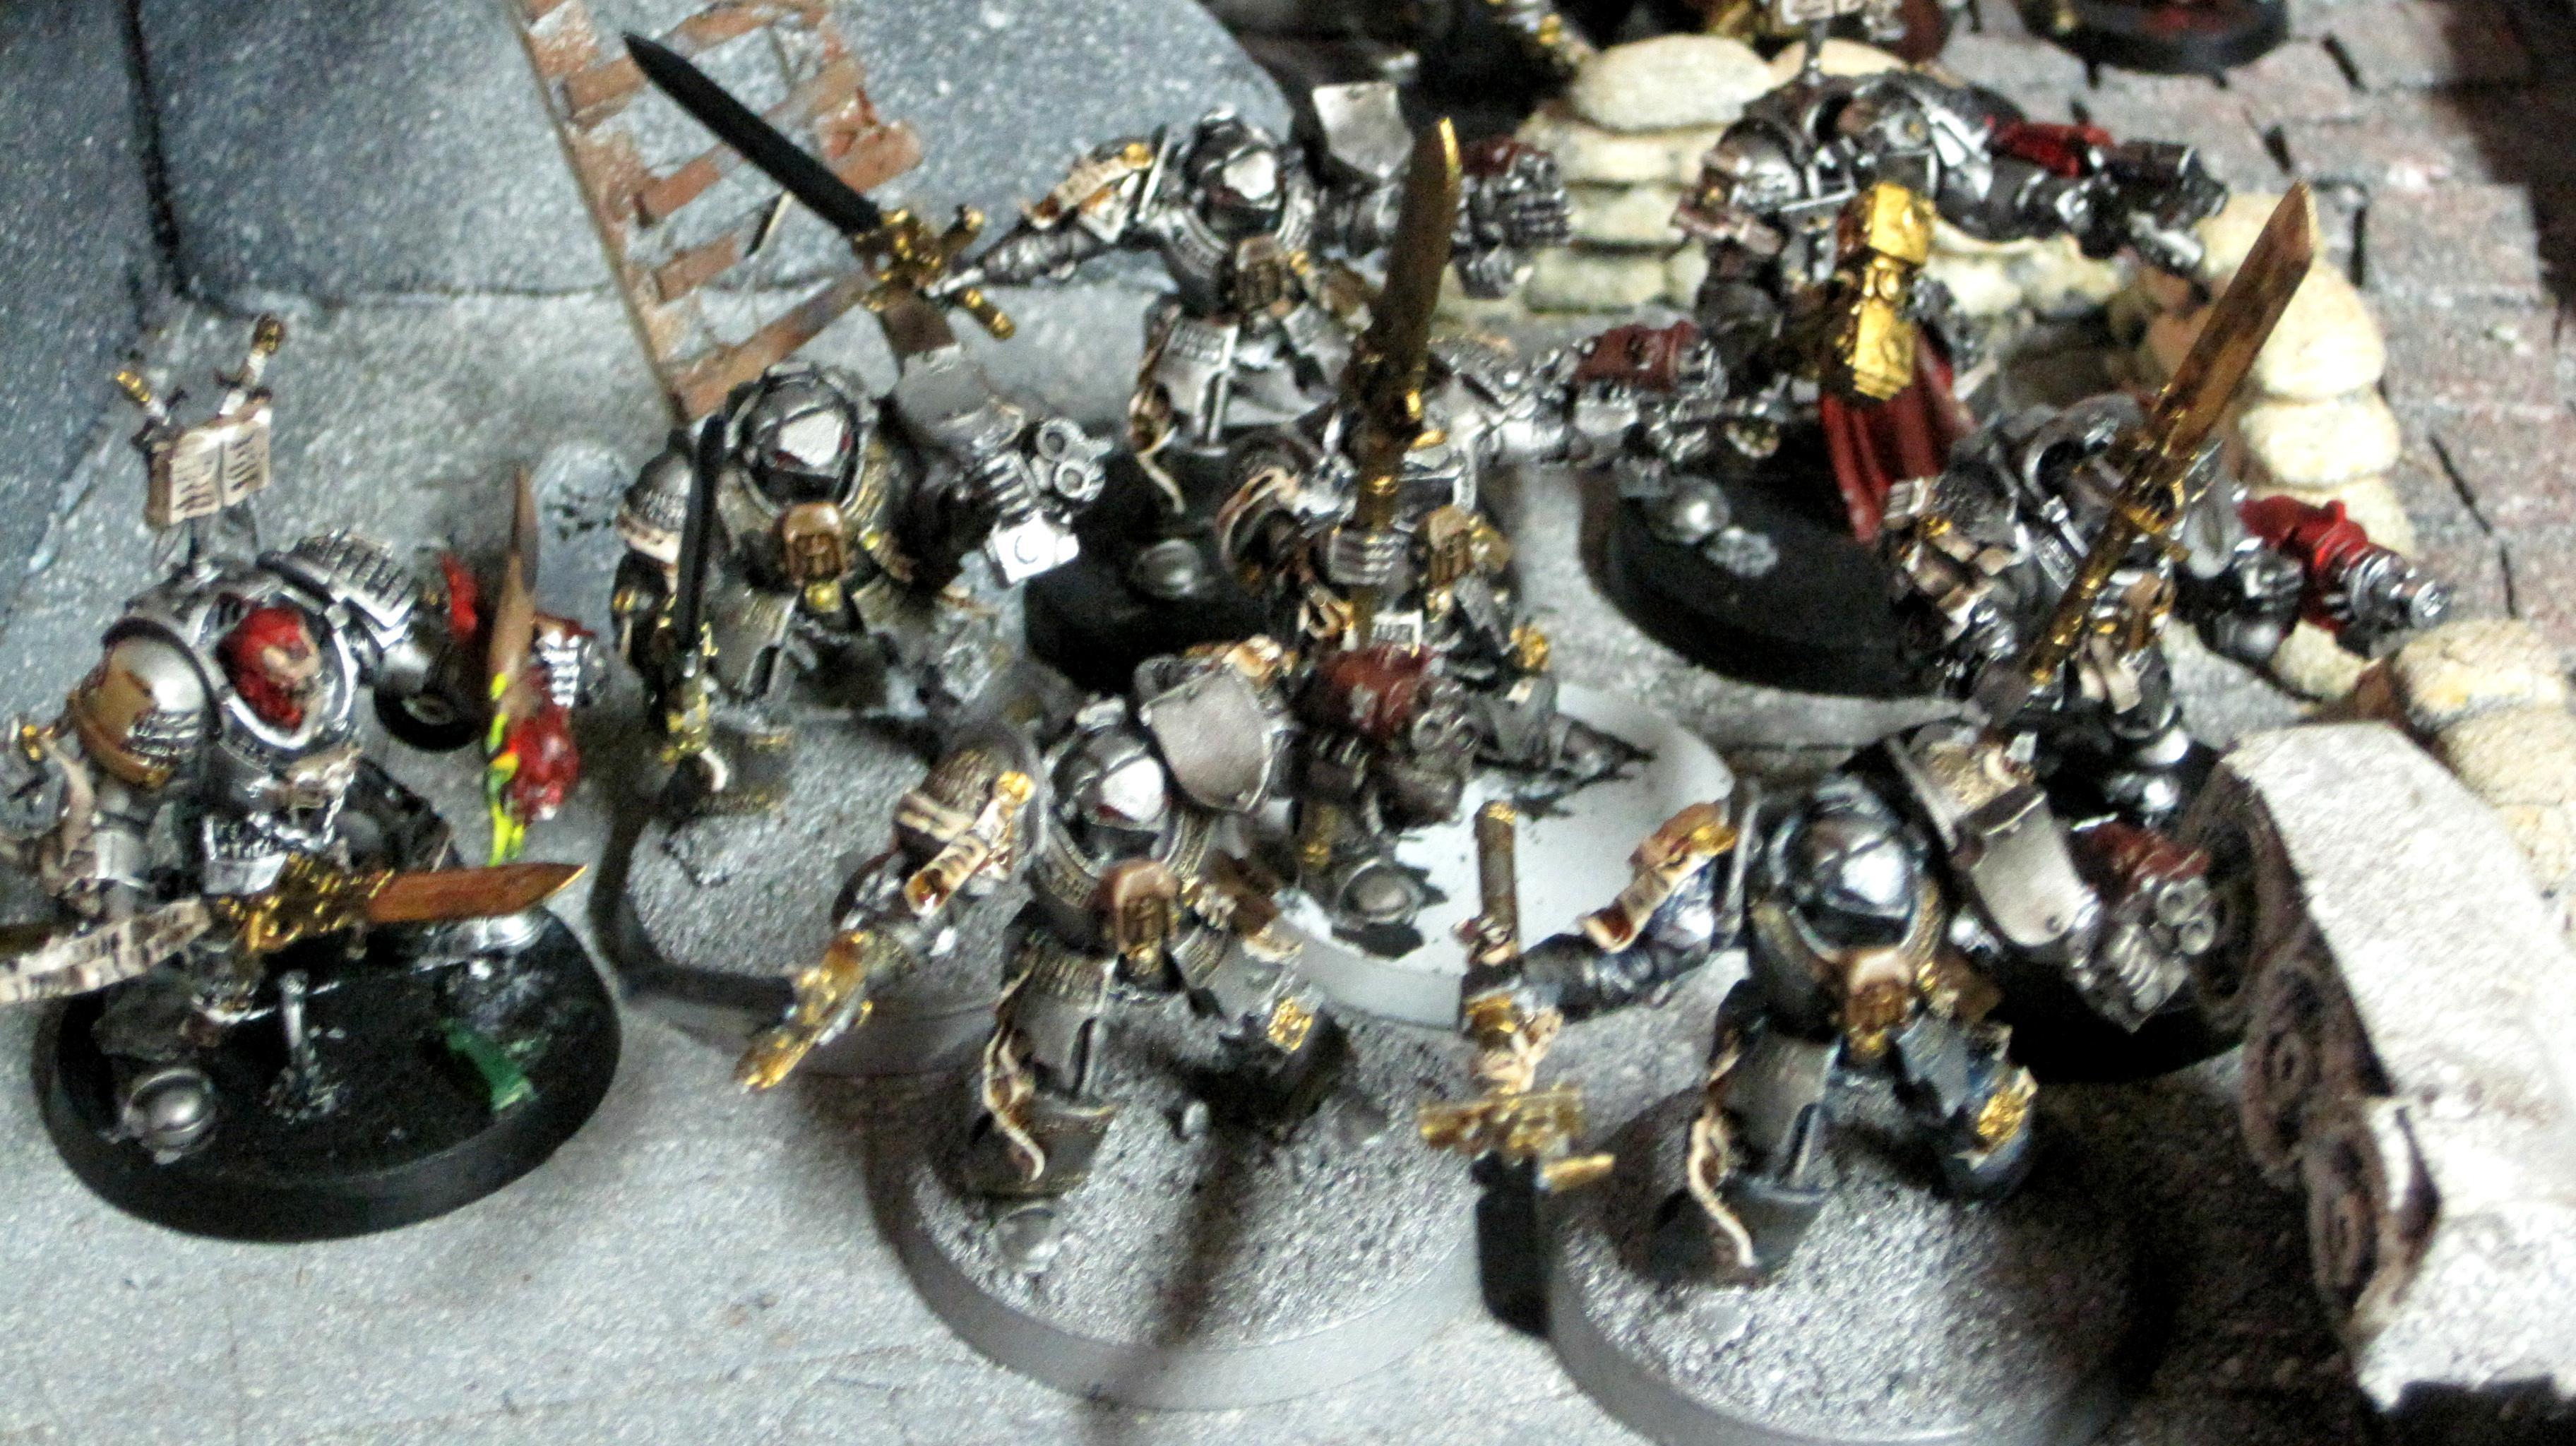 Crowe, Dread Knight, Grey Knights, Karamazov, Payne, Propainted